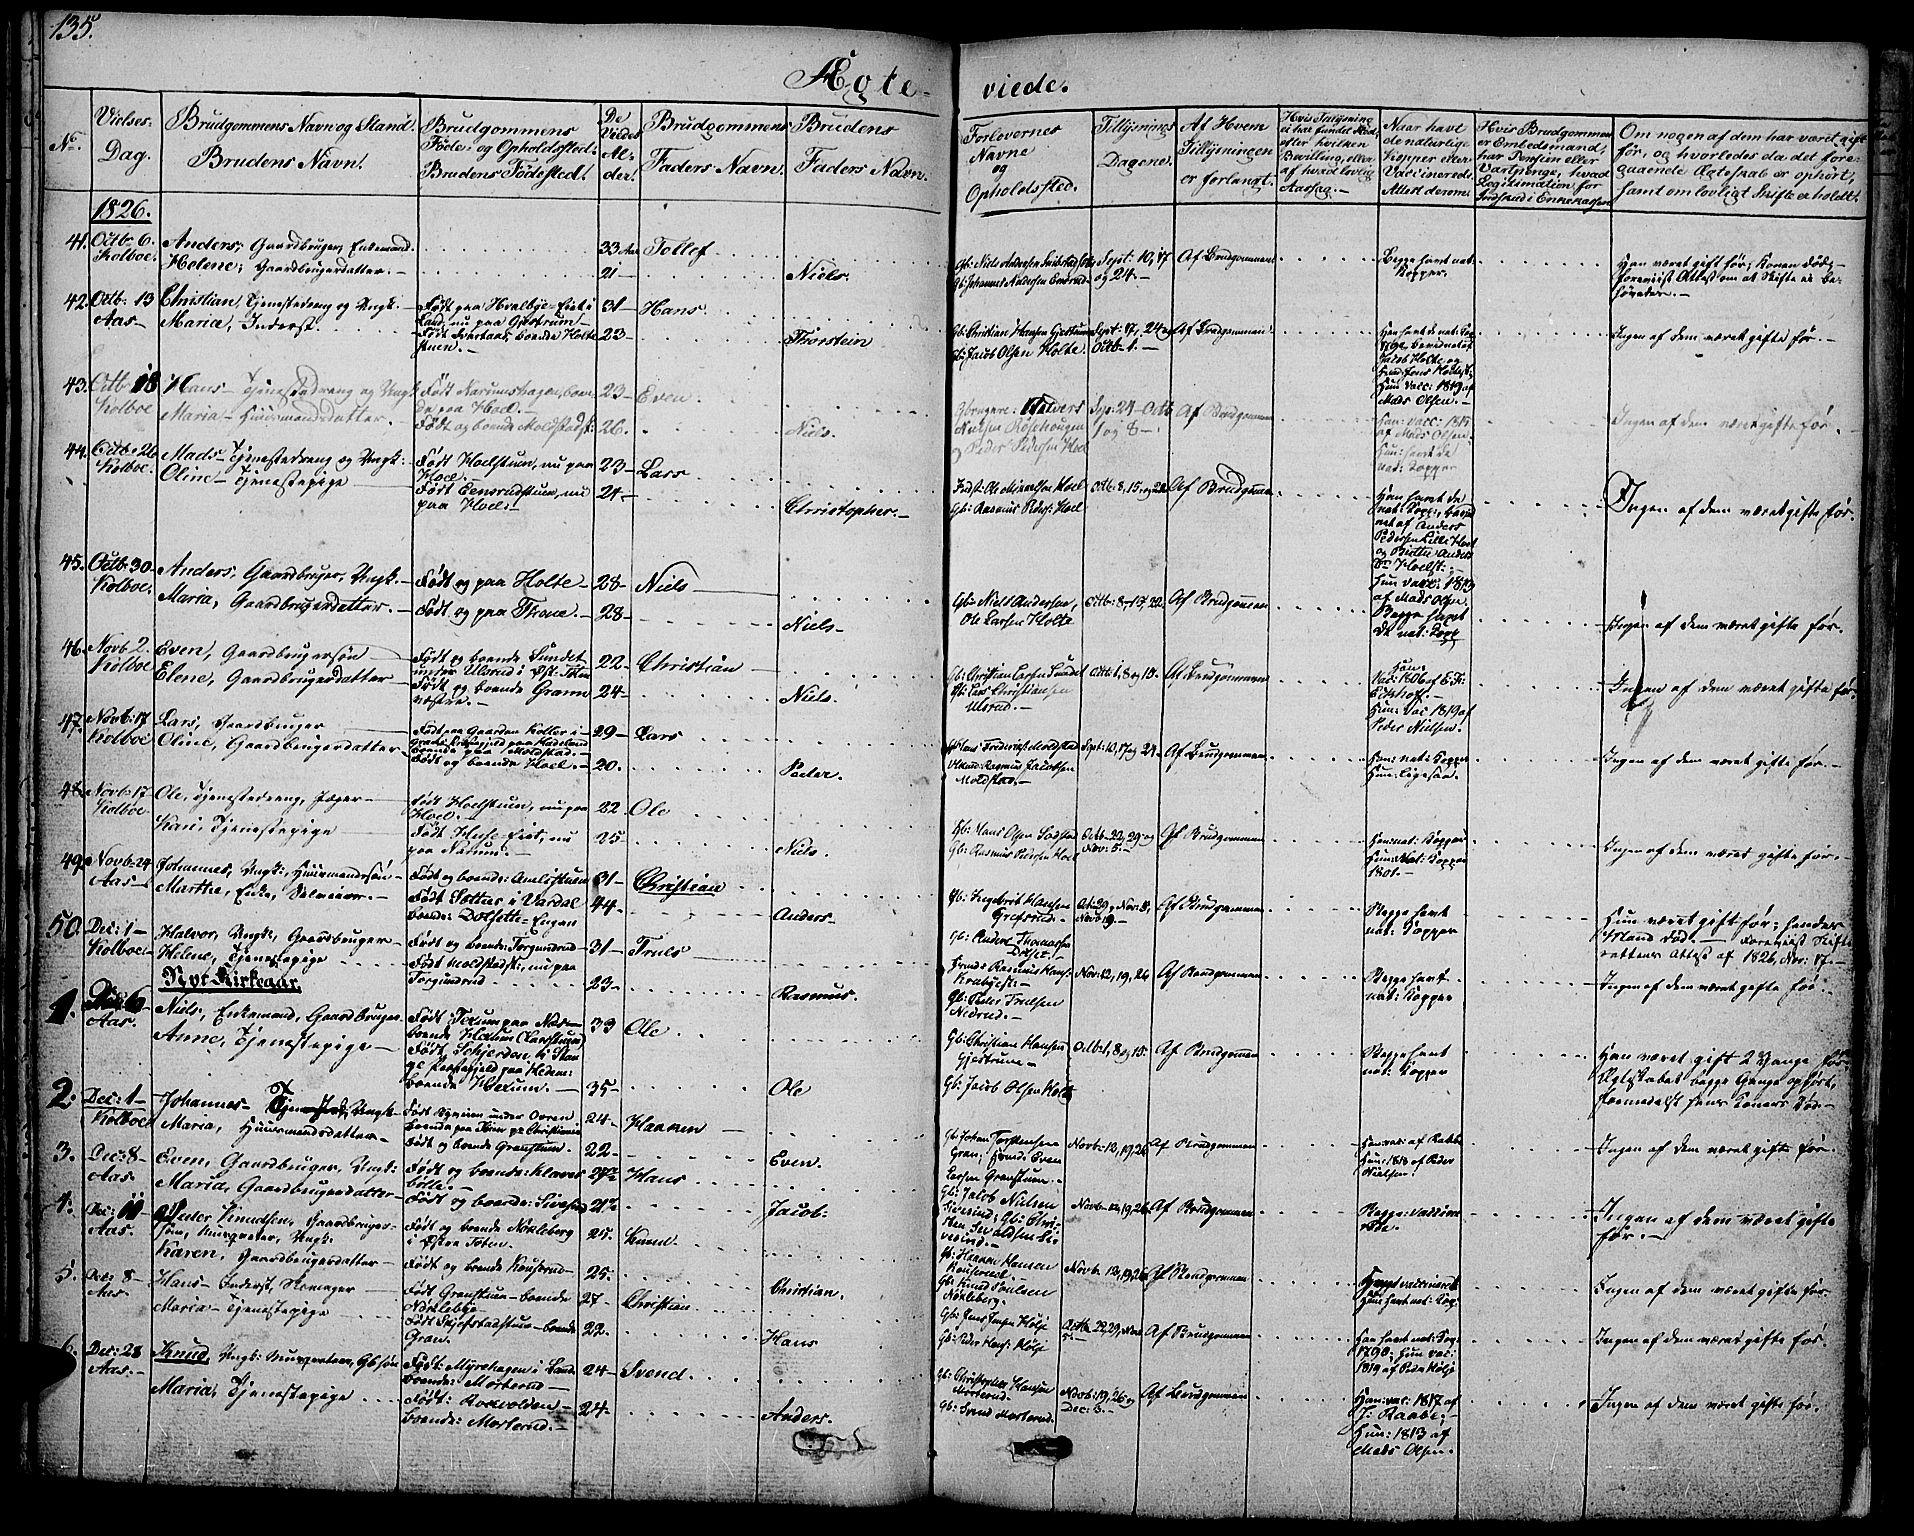 SAH, Vestre Toten prestekontor, H/Ha/Haa/L0002: Ministerialbok nr. 2, 1825-1837, s. 135